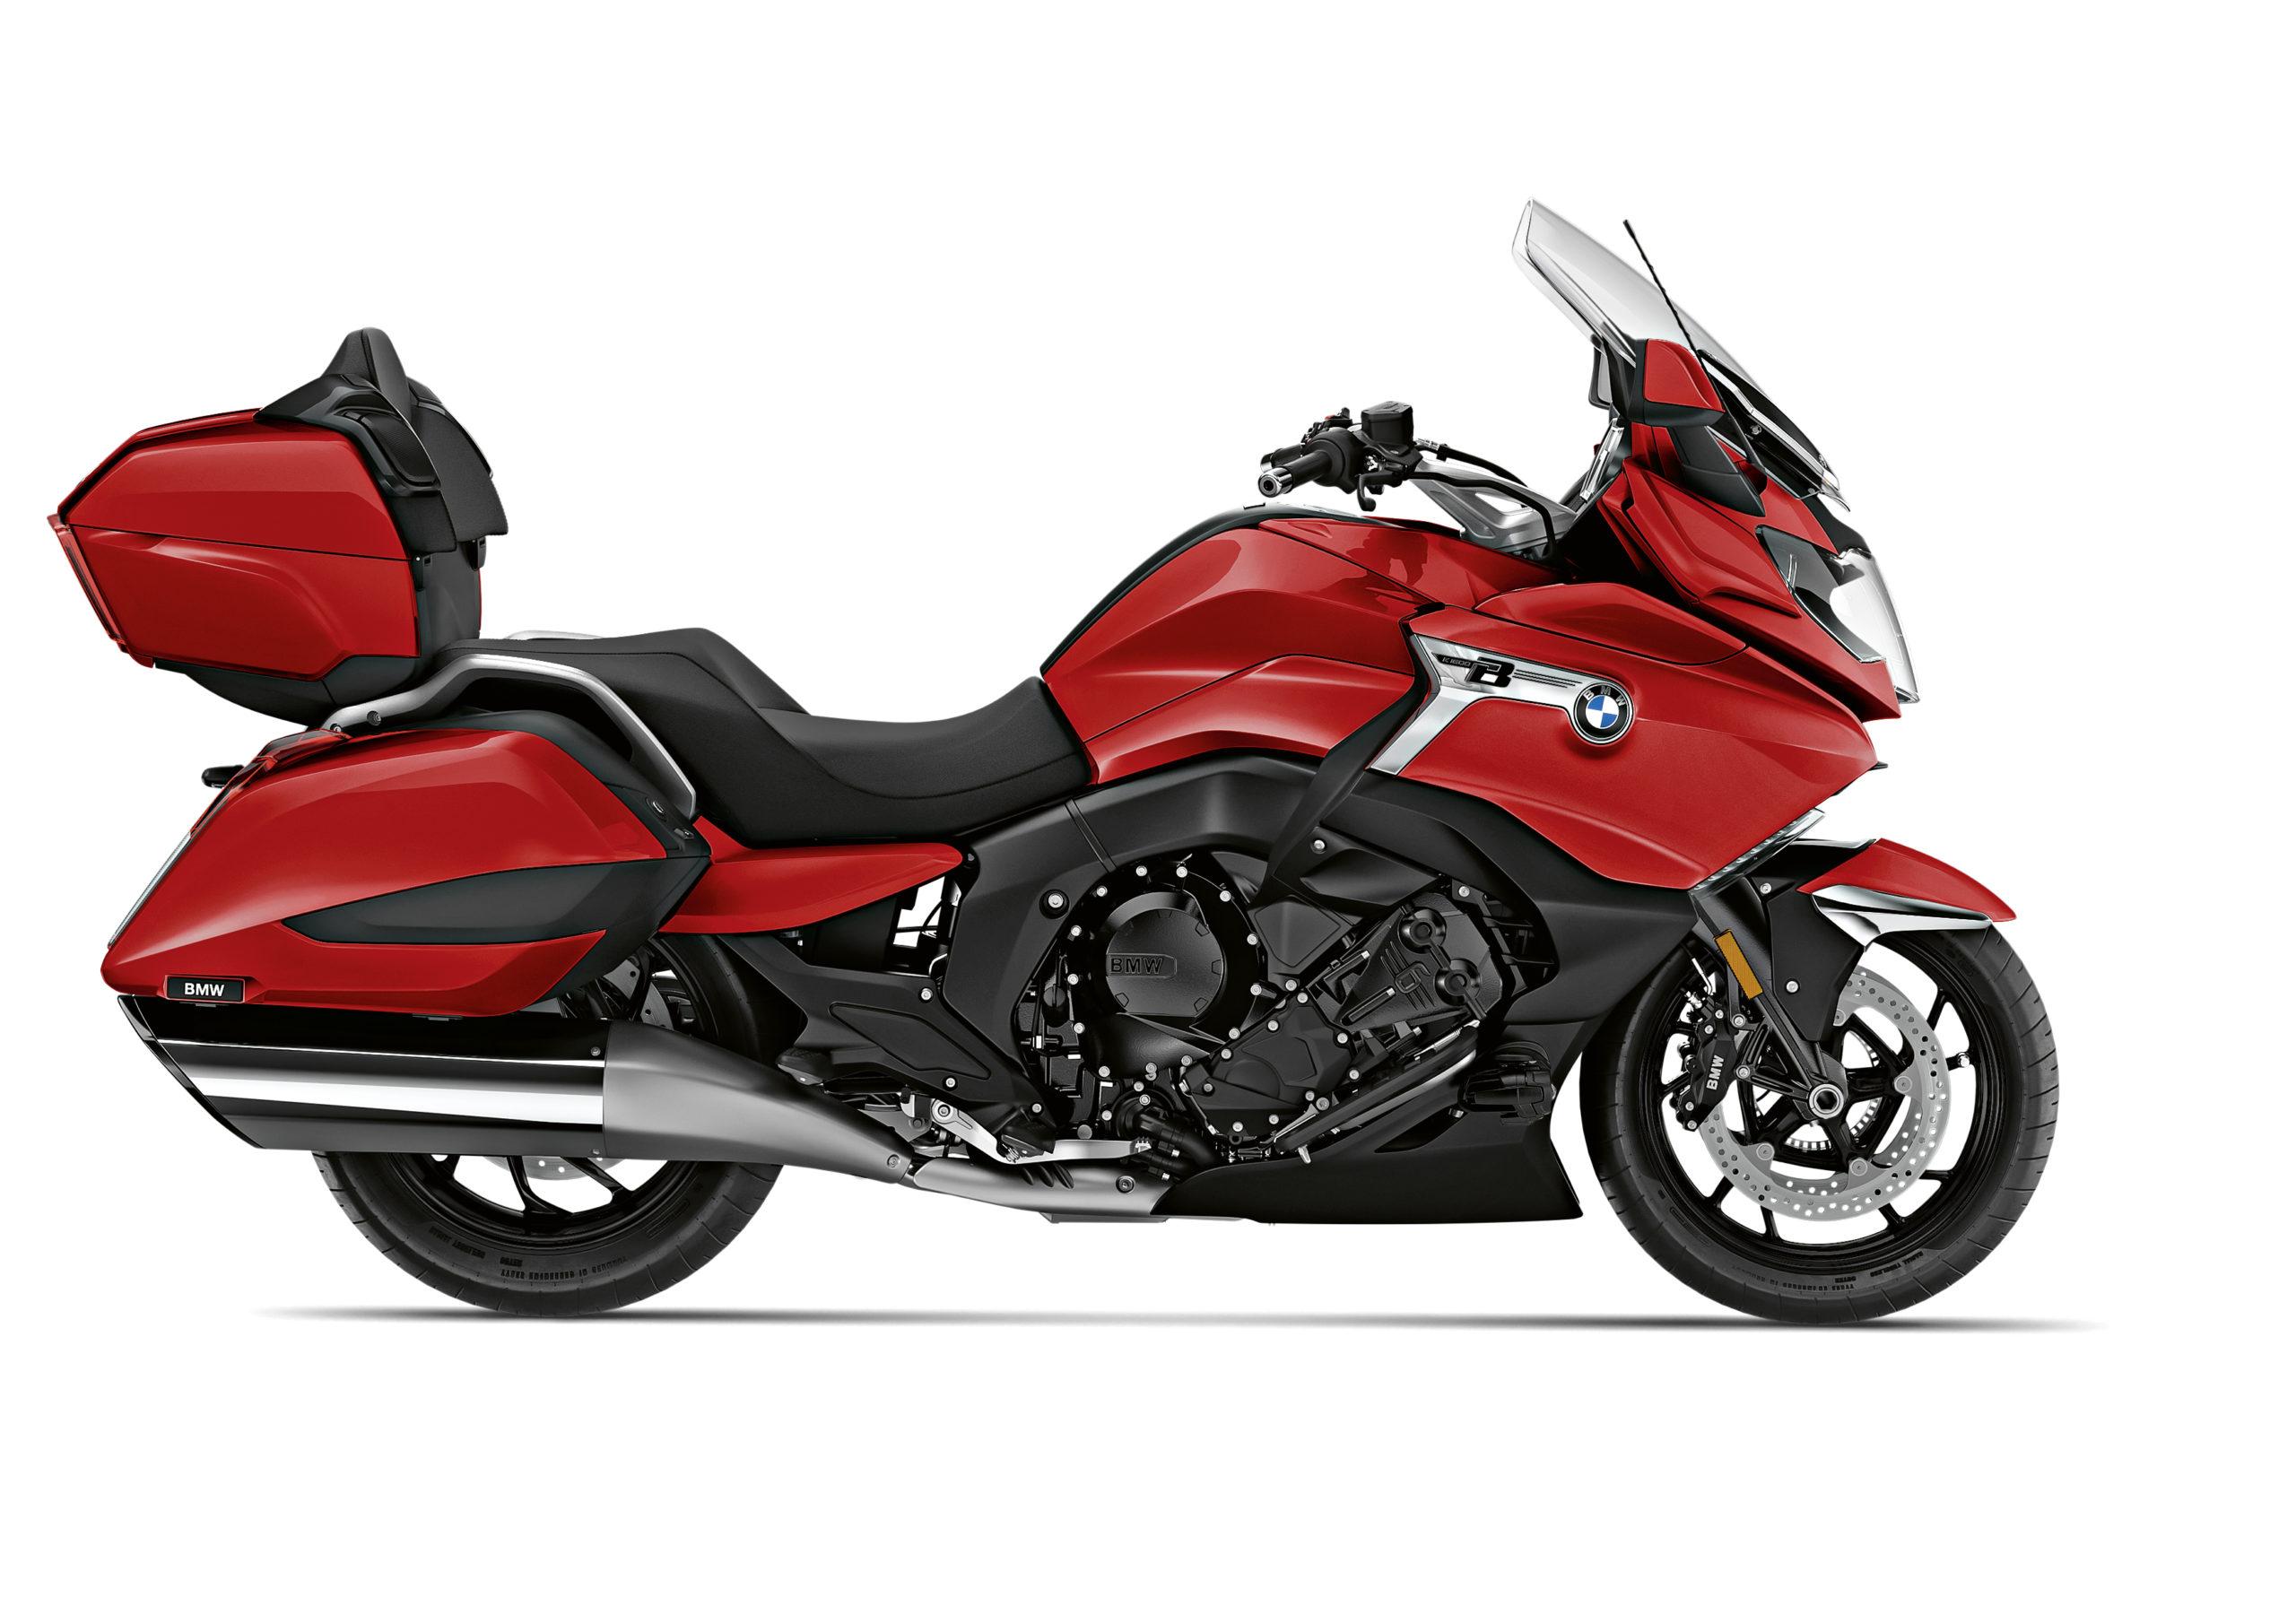 bmw motorrad updates its 2021 motorcycle model range